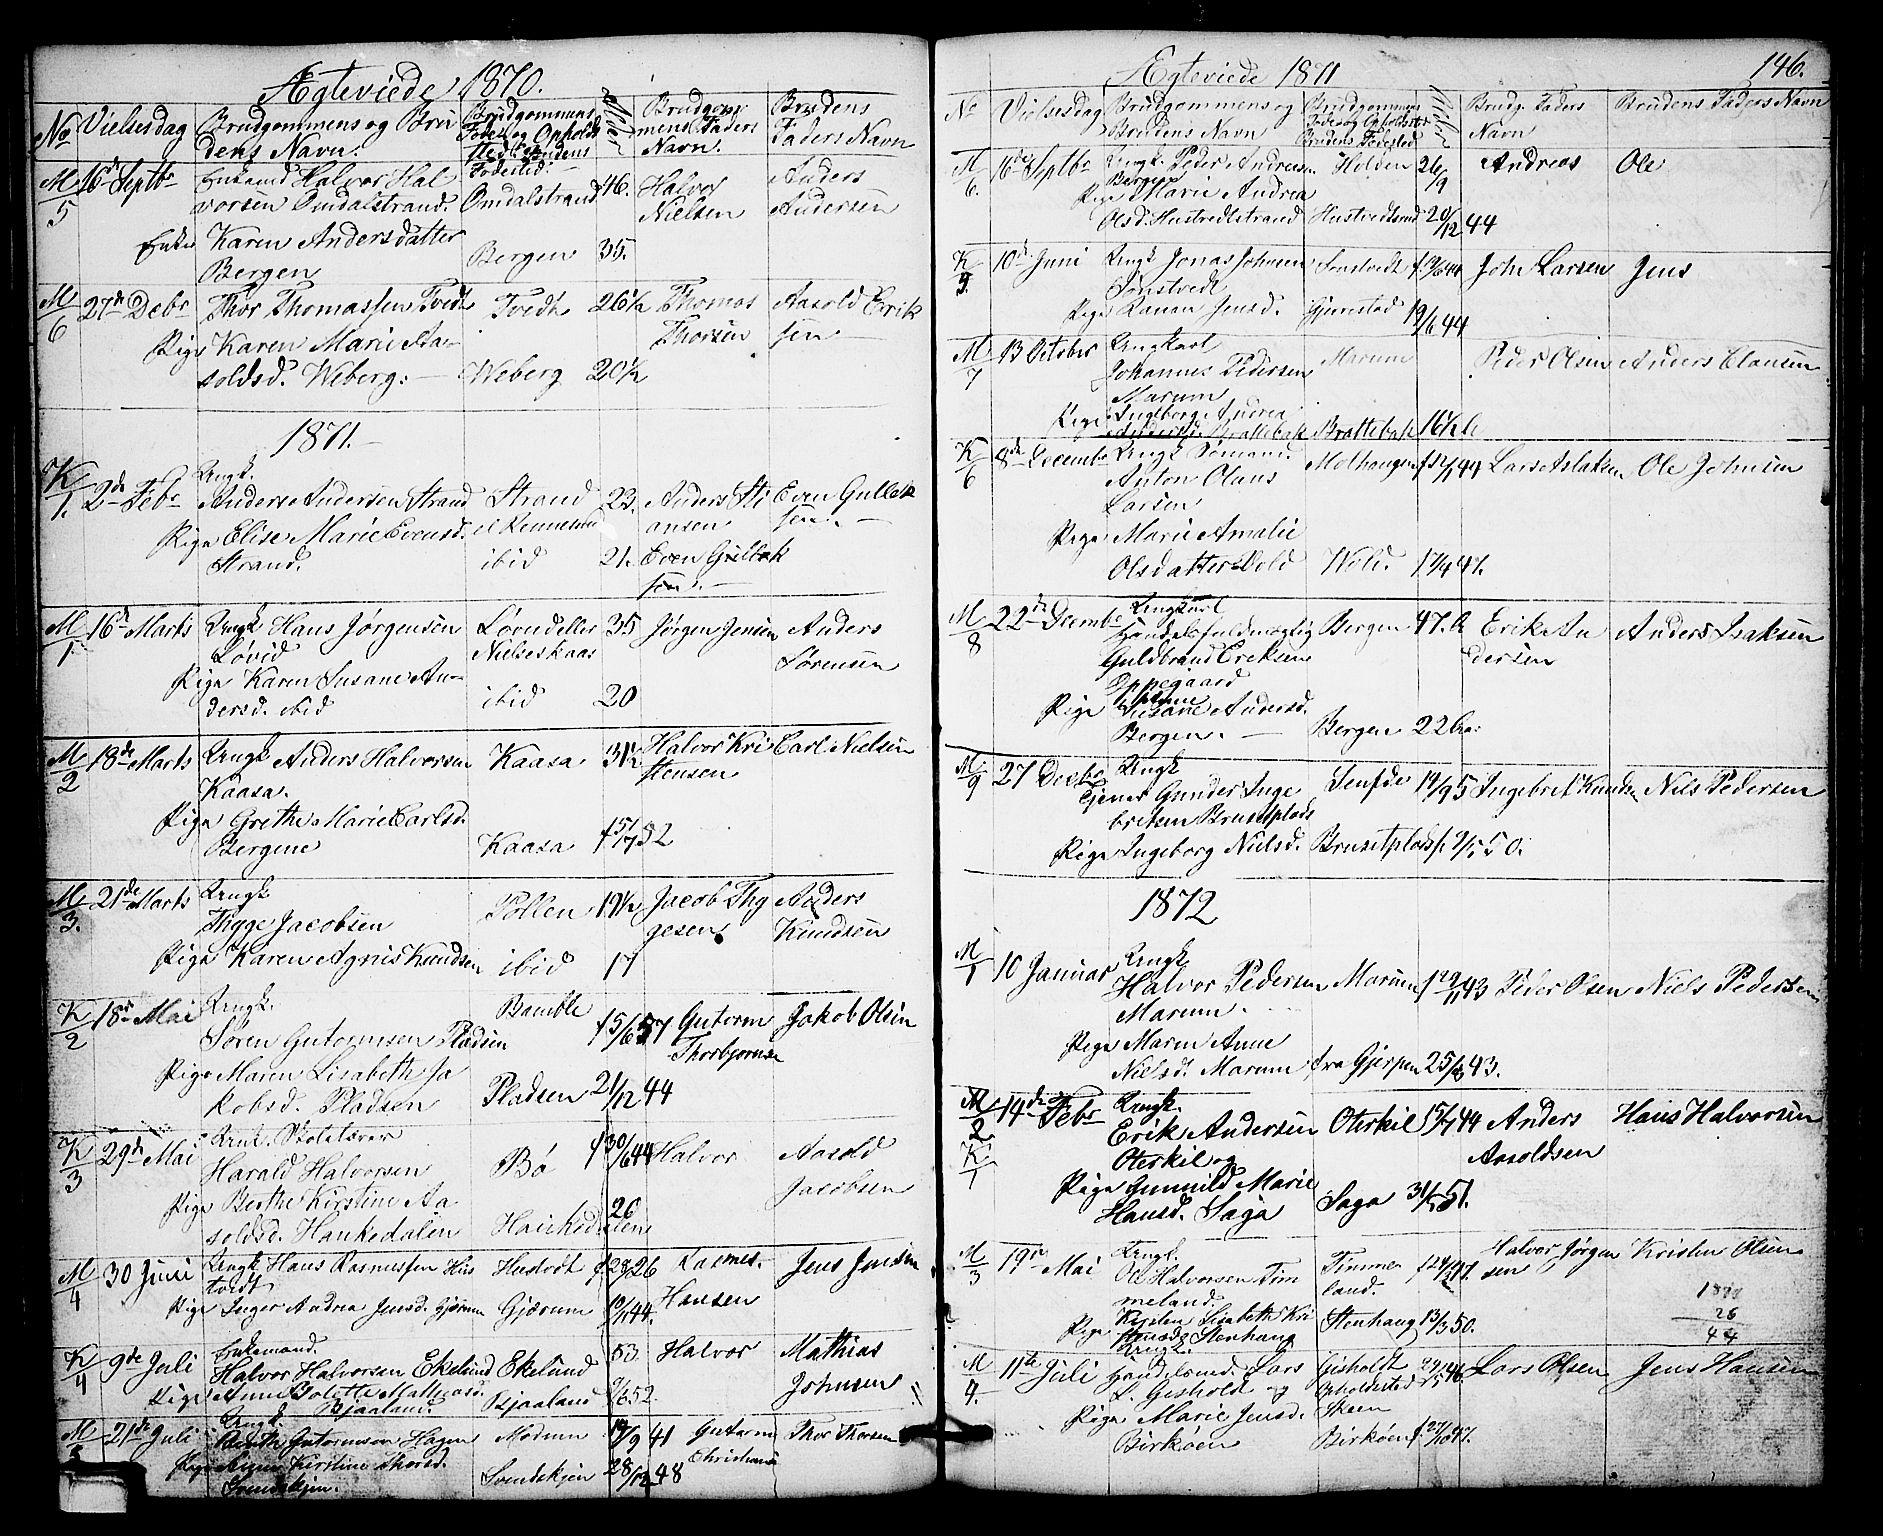 SAKO, Solum kirkebøker, G/Gb/L0002: Klokkerbok nr. II 2, 1859-1879, s. 146